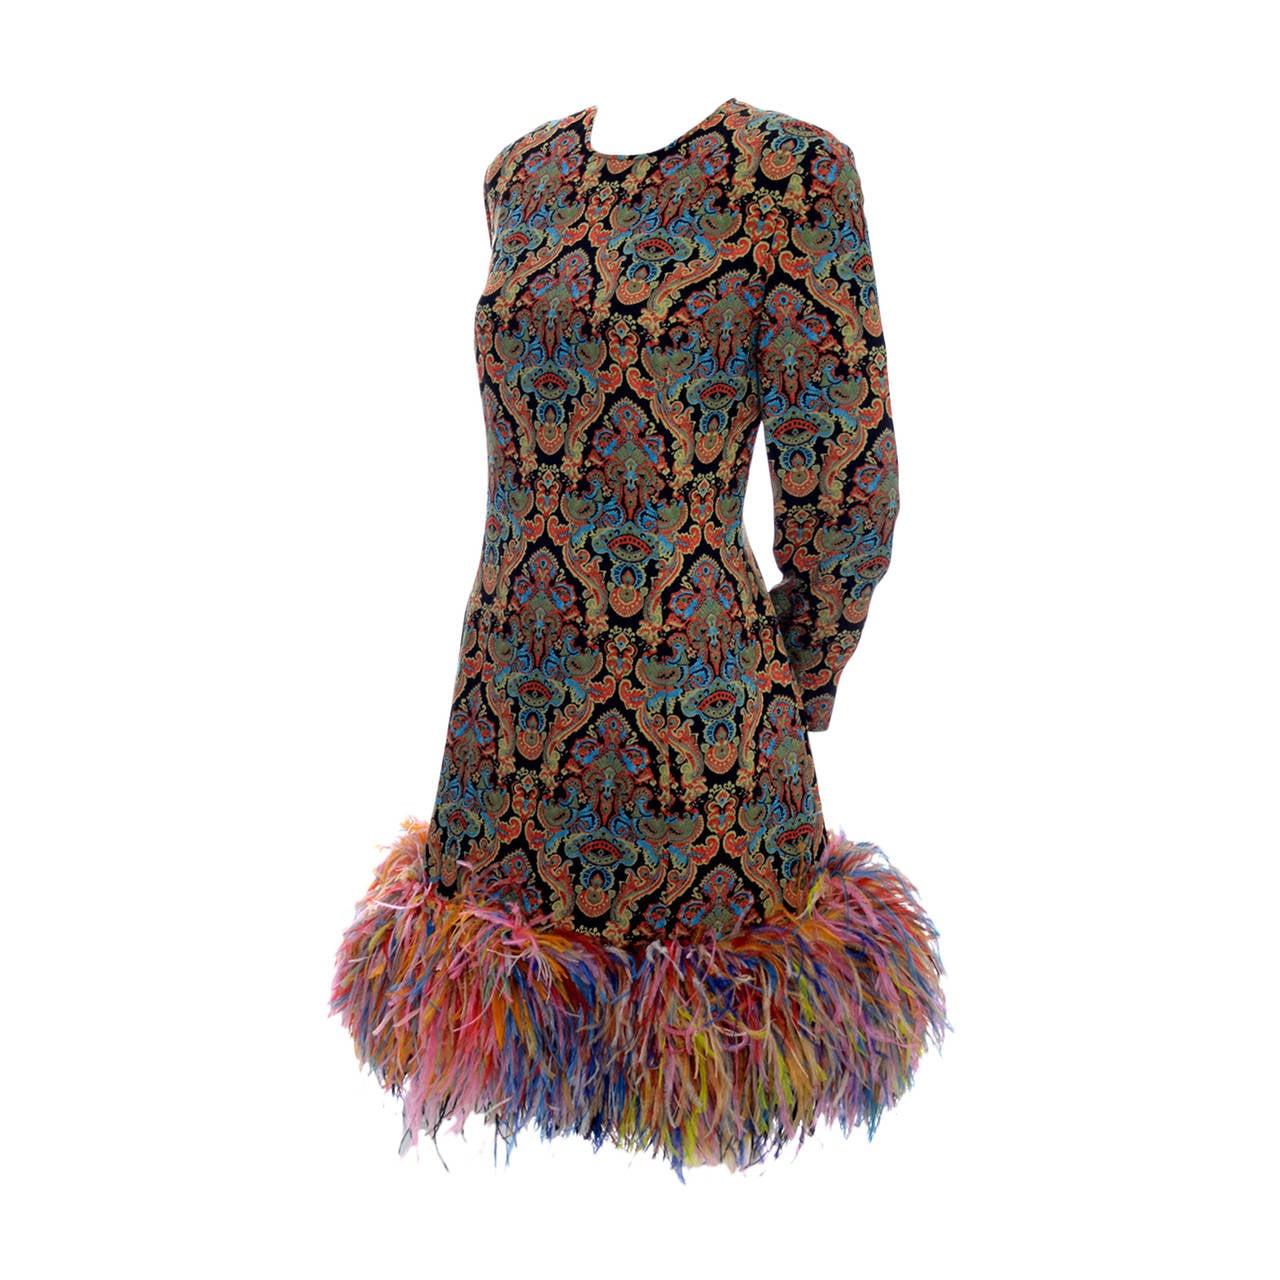 Galanos Designer Vintage Dress Ostrich Feathers 1980s Neiman Marcus ...